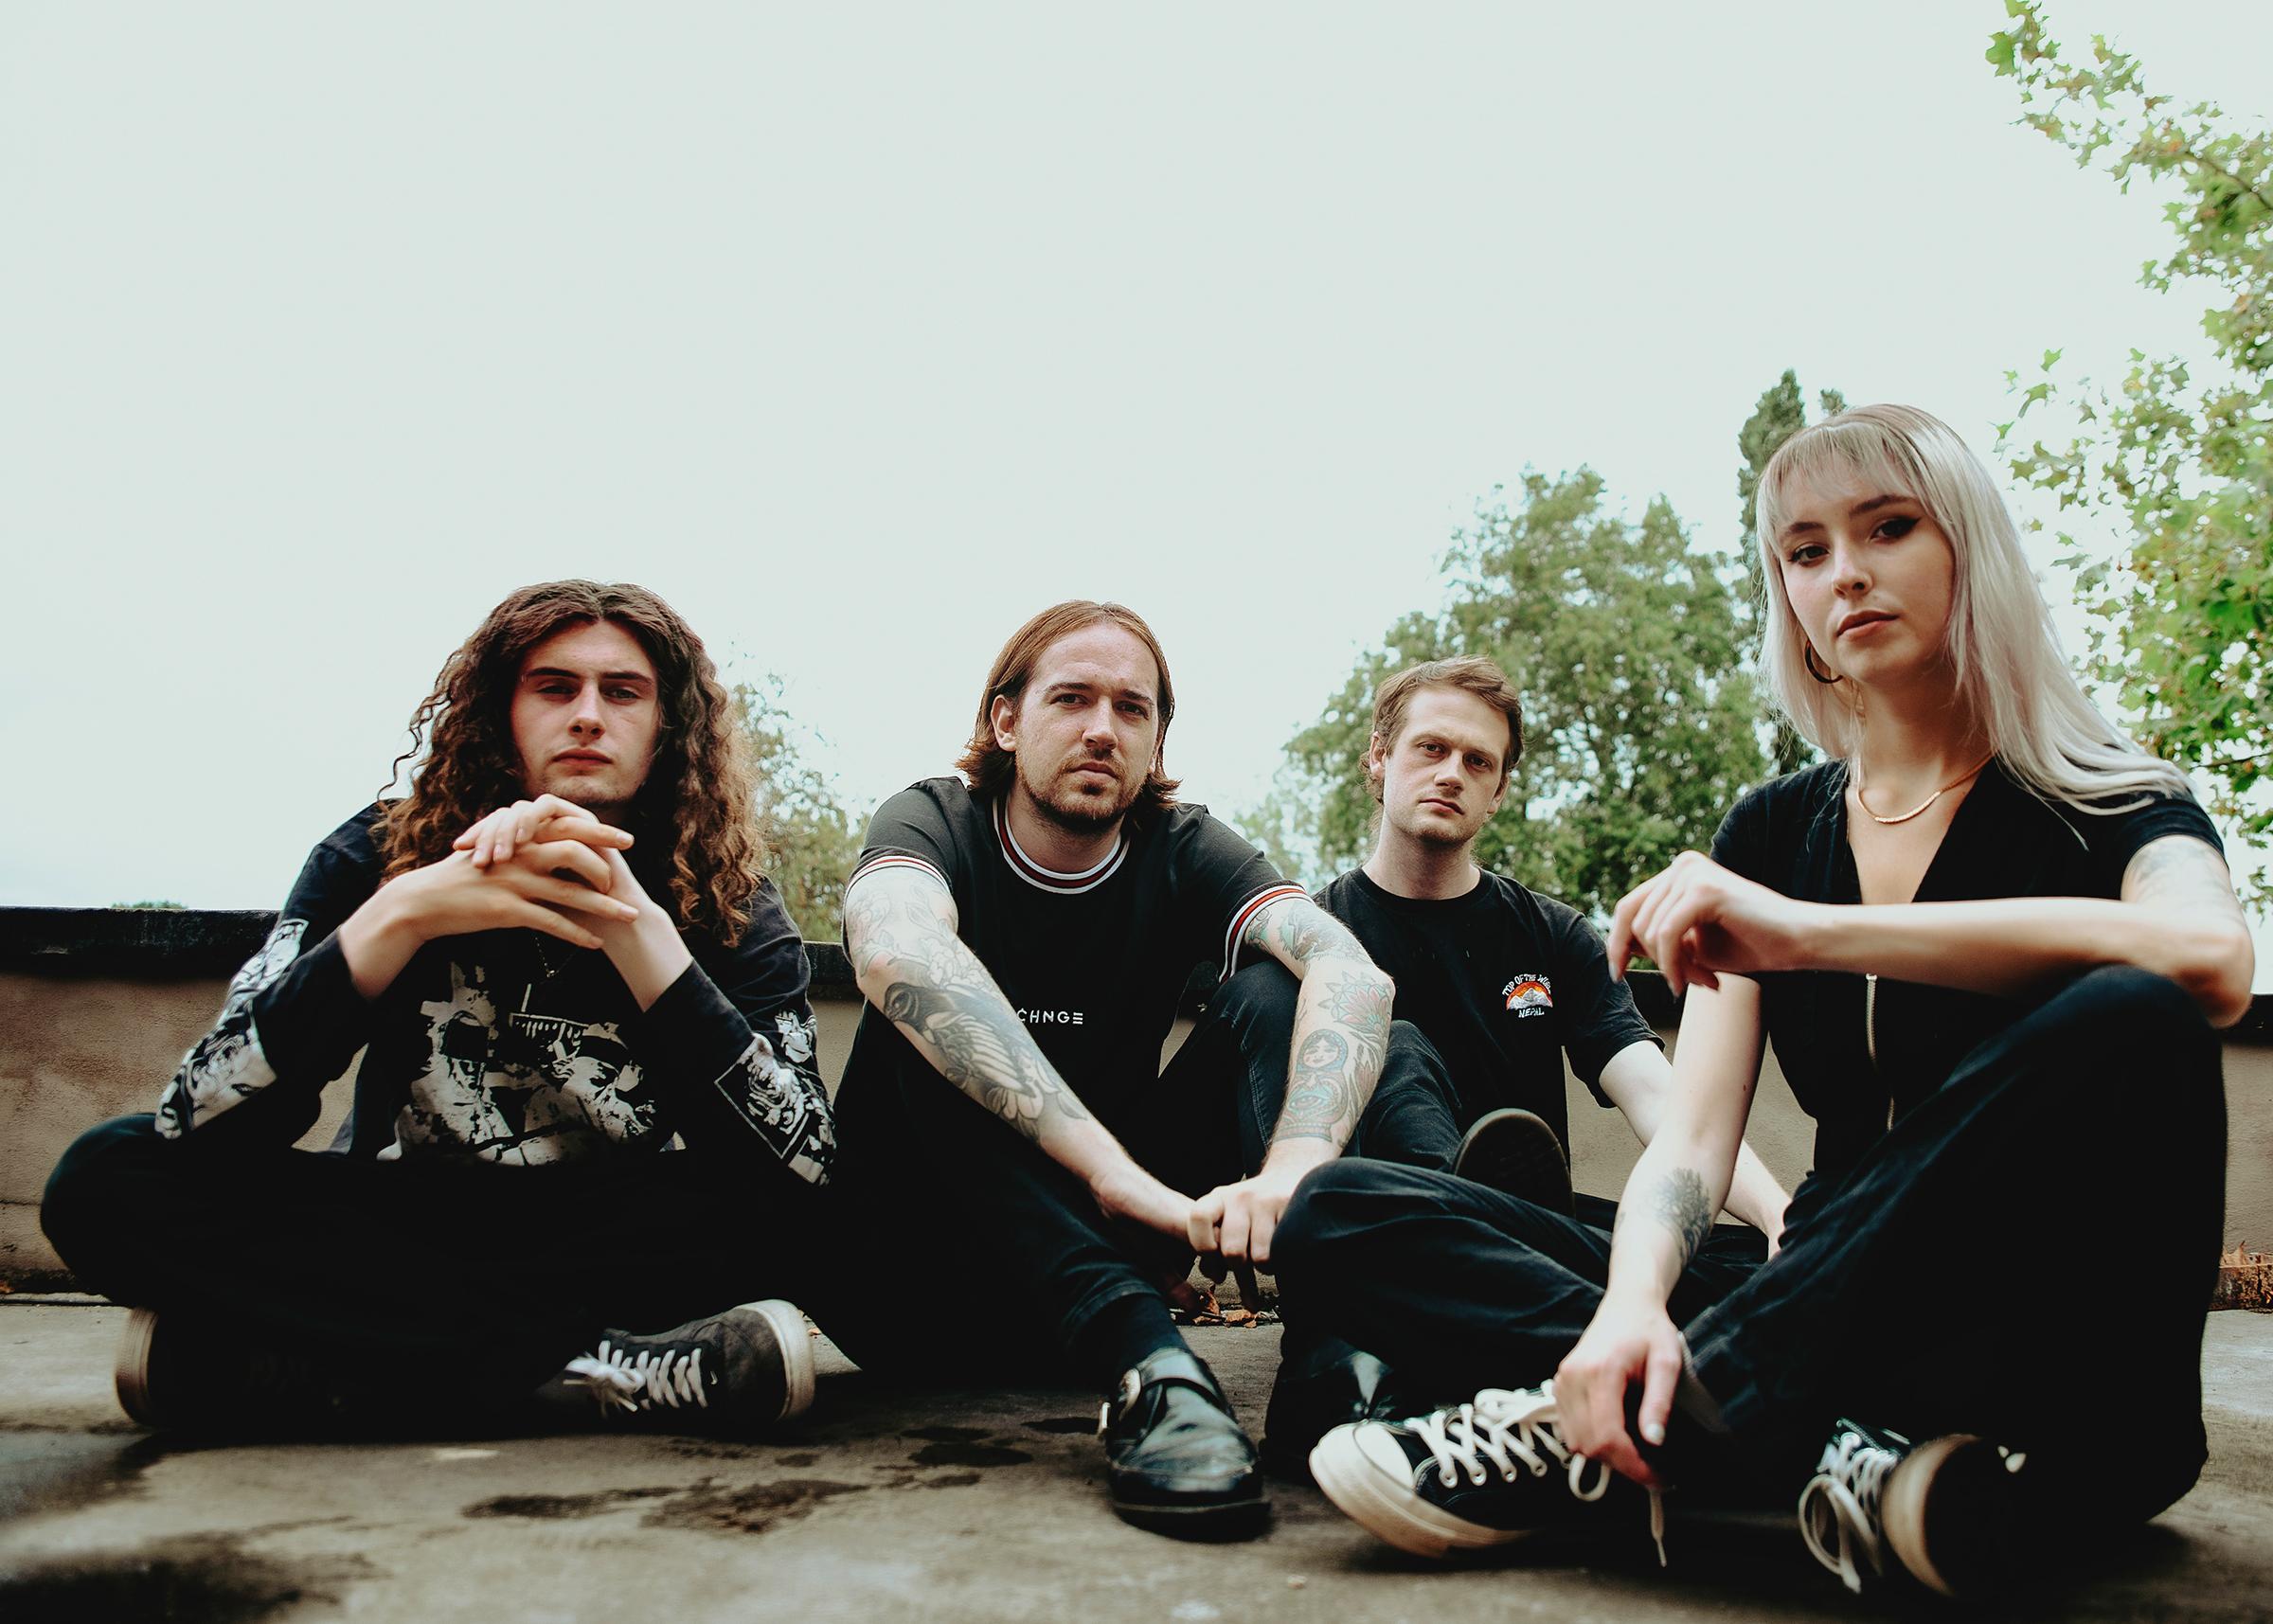 BLEACH LAB Announce debut EP 'A Calm Sense of Surrounding' - Hear lead single 'Old Ways'